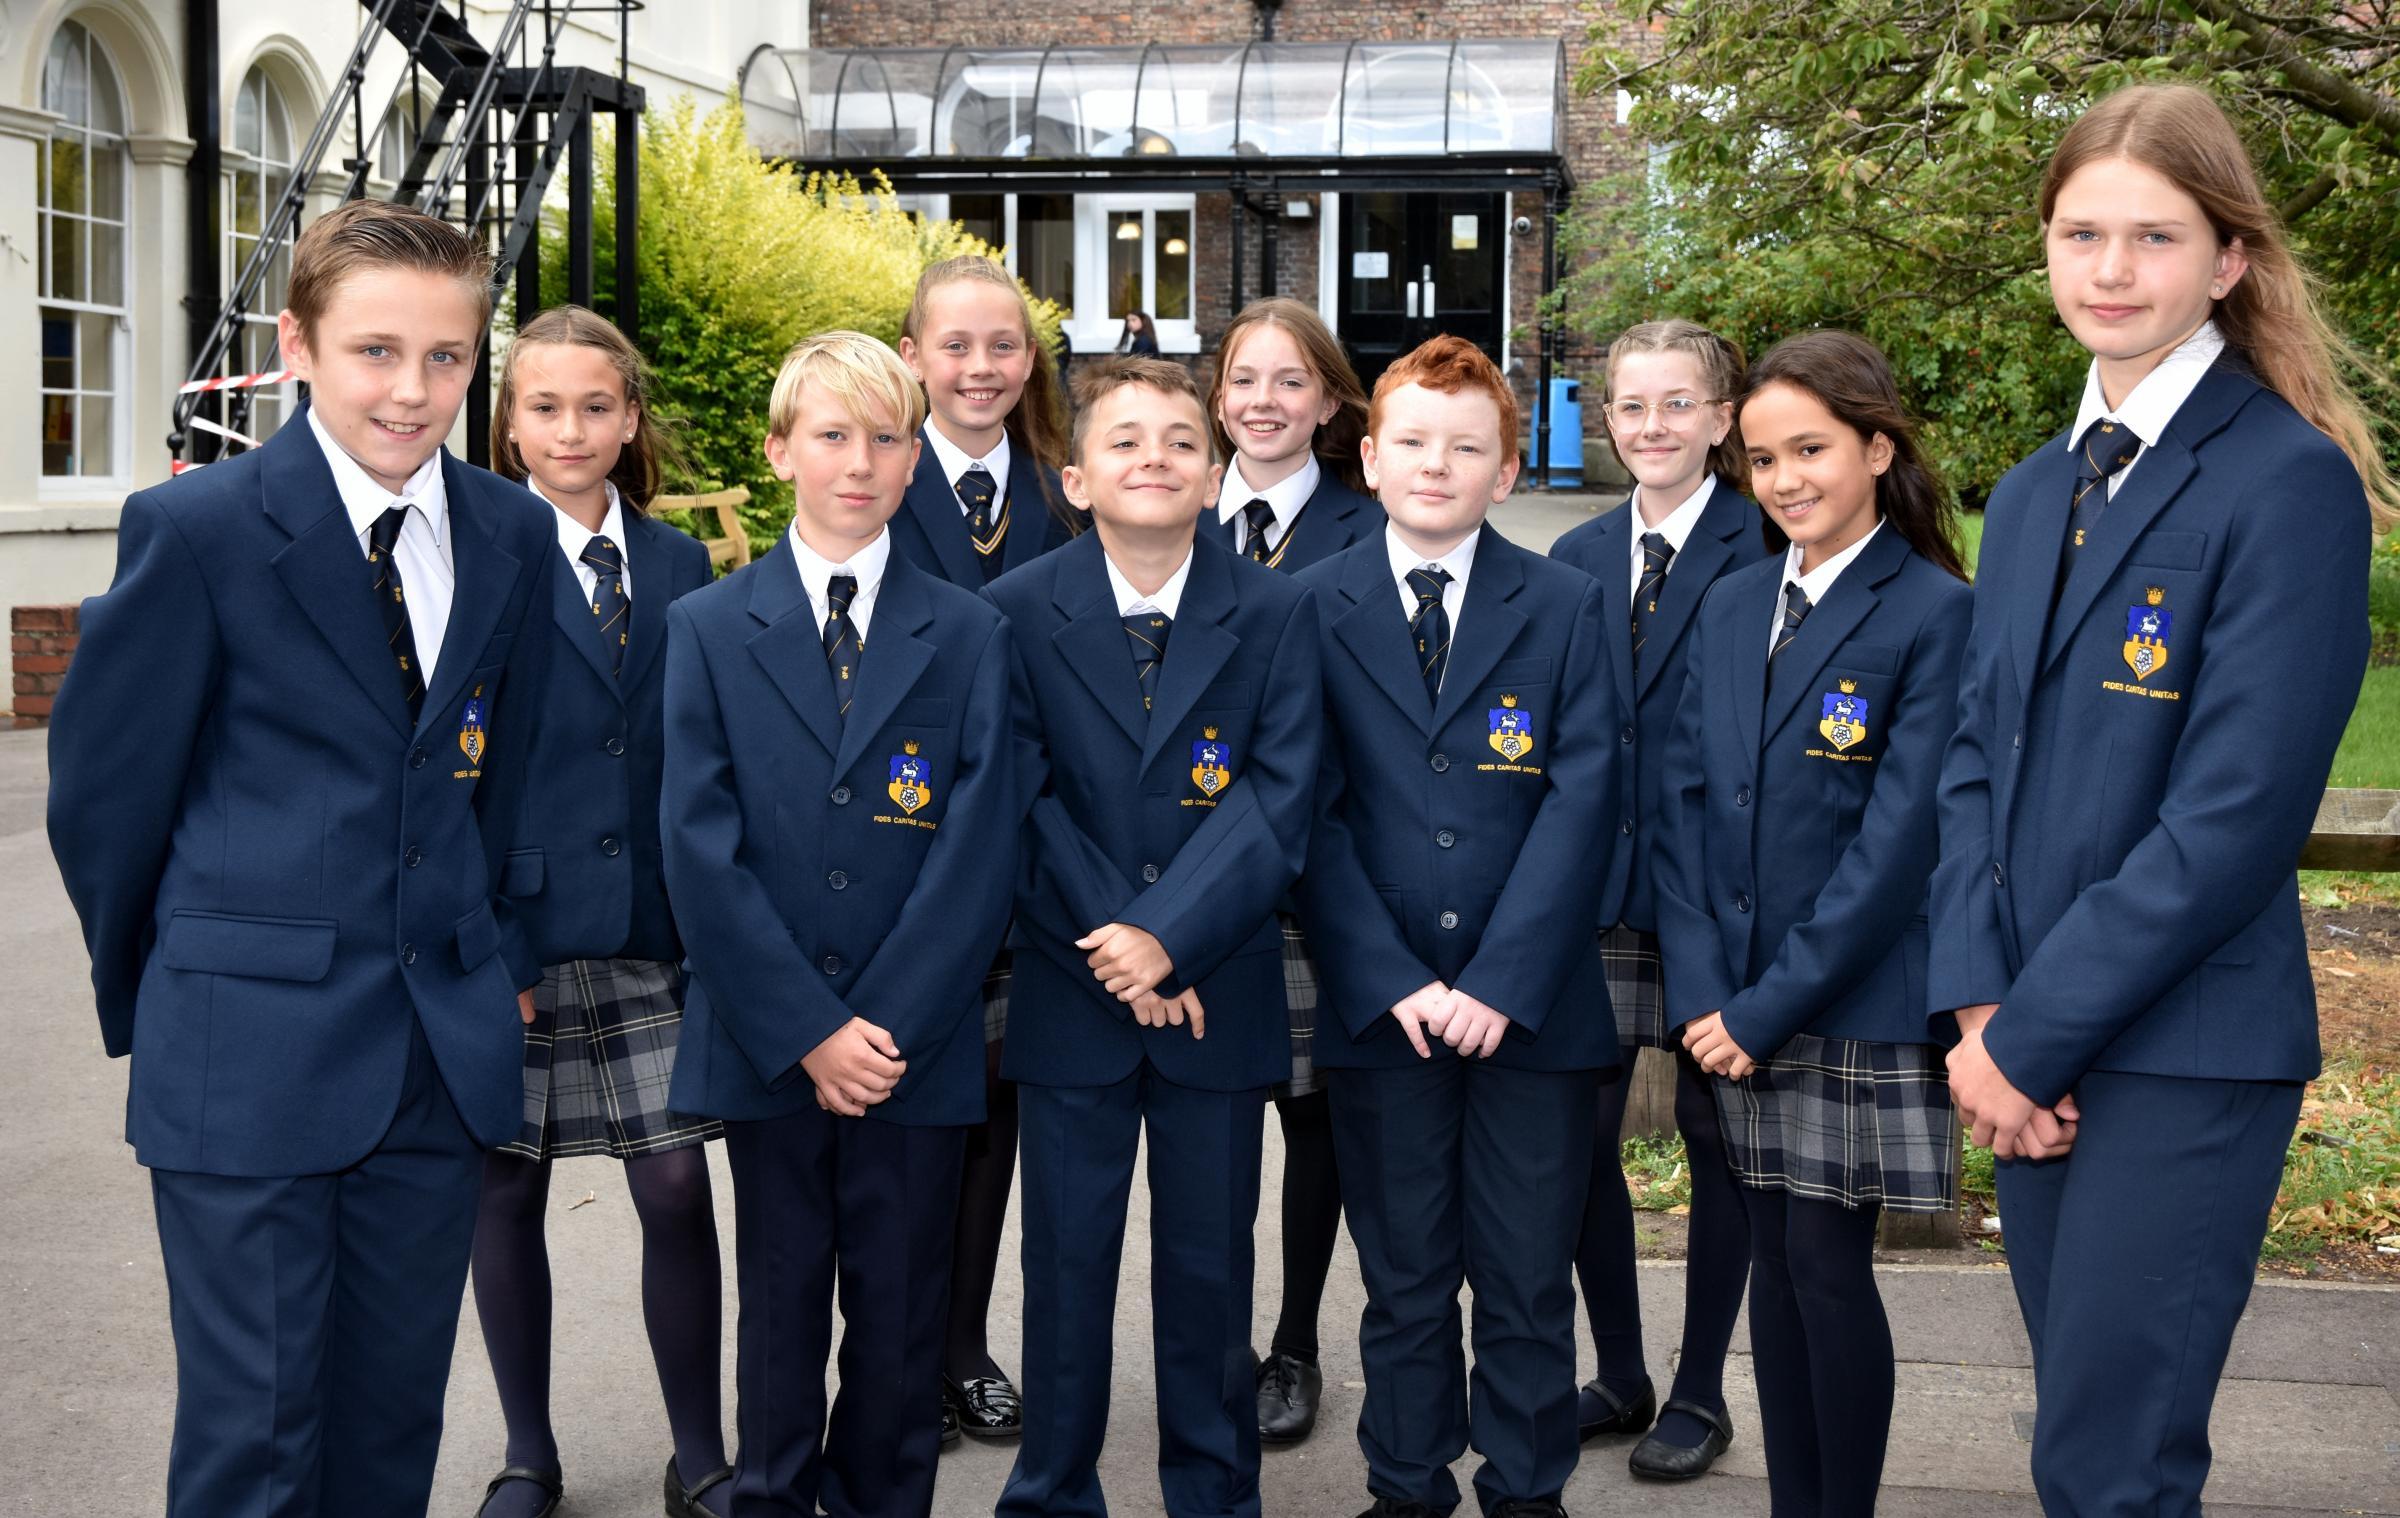 All Saints Rc School In York Brings In New School Uniform York Press